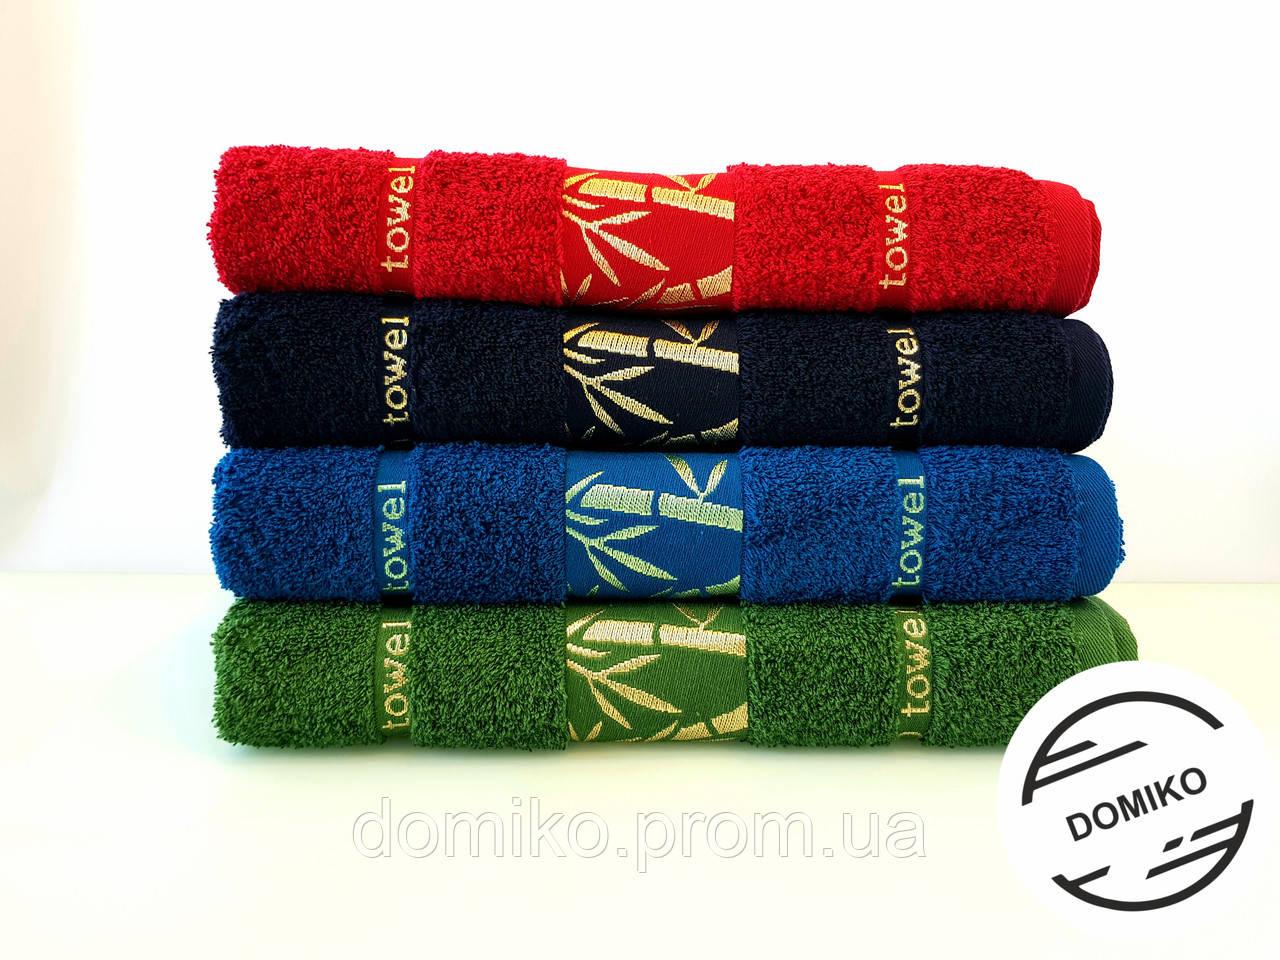 Полотенце махровое Бамбук